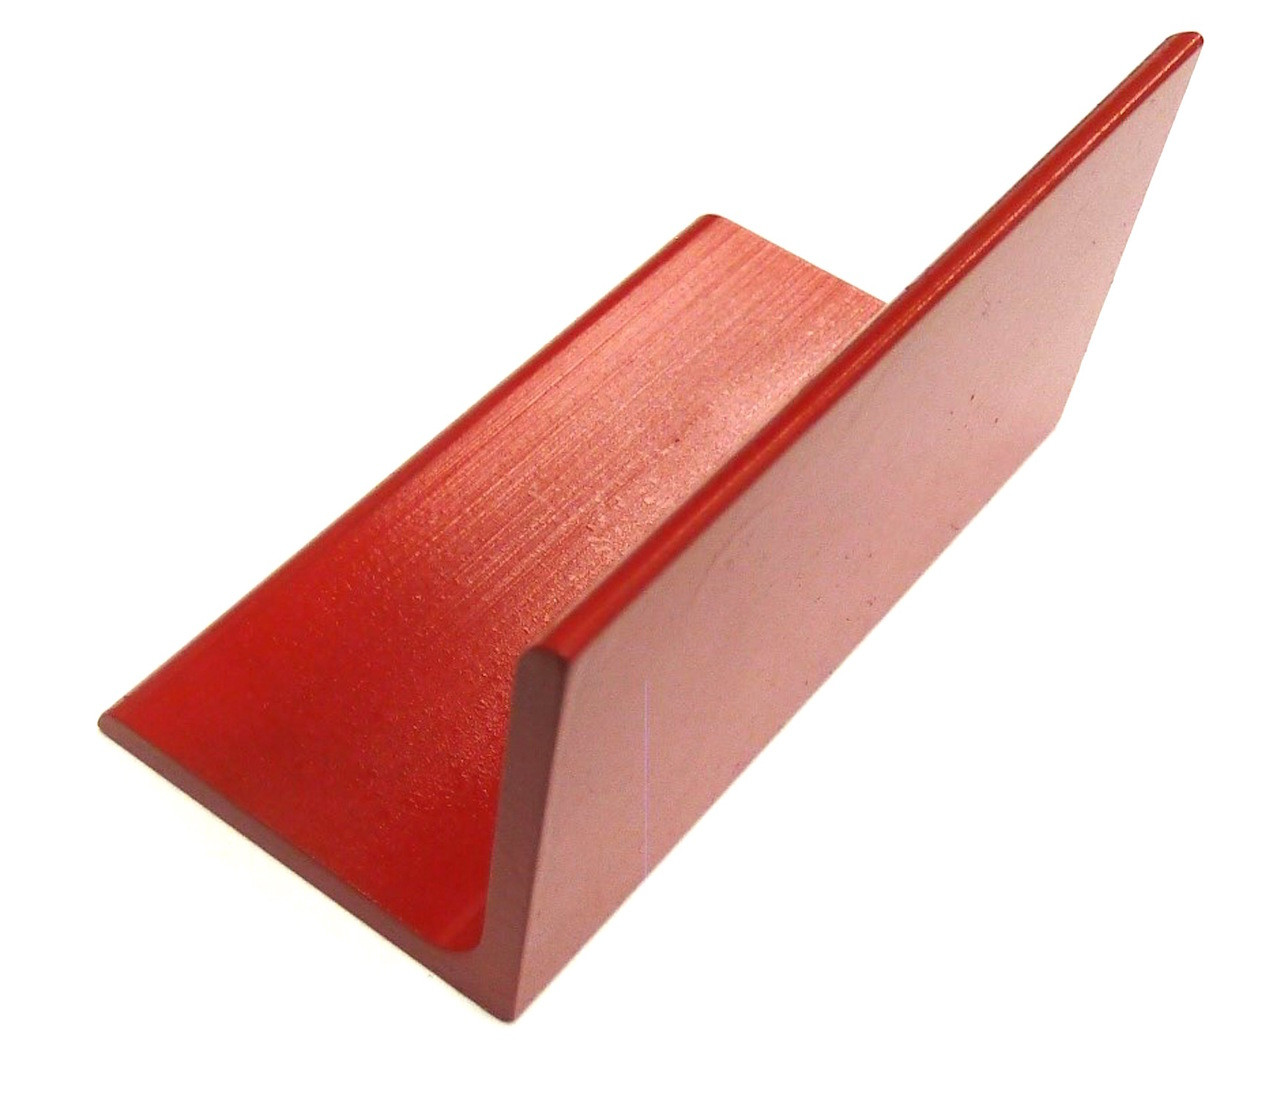 XMG Bolt Hold Open Block